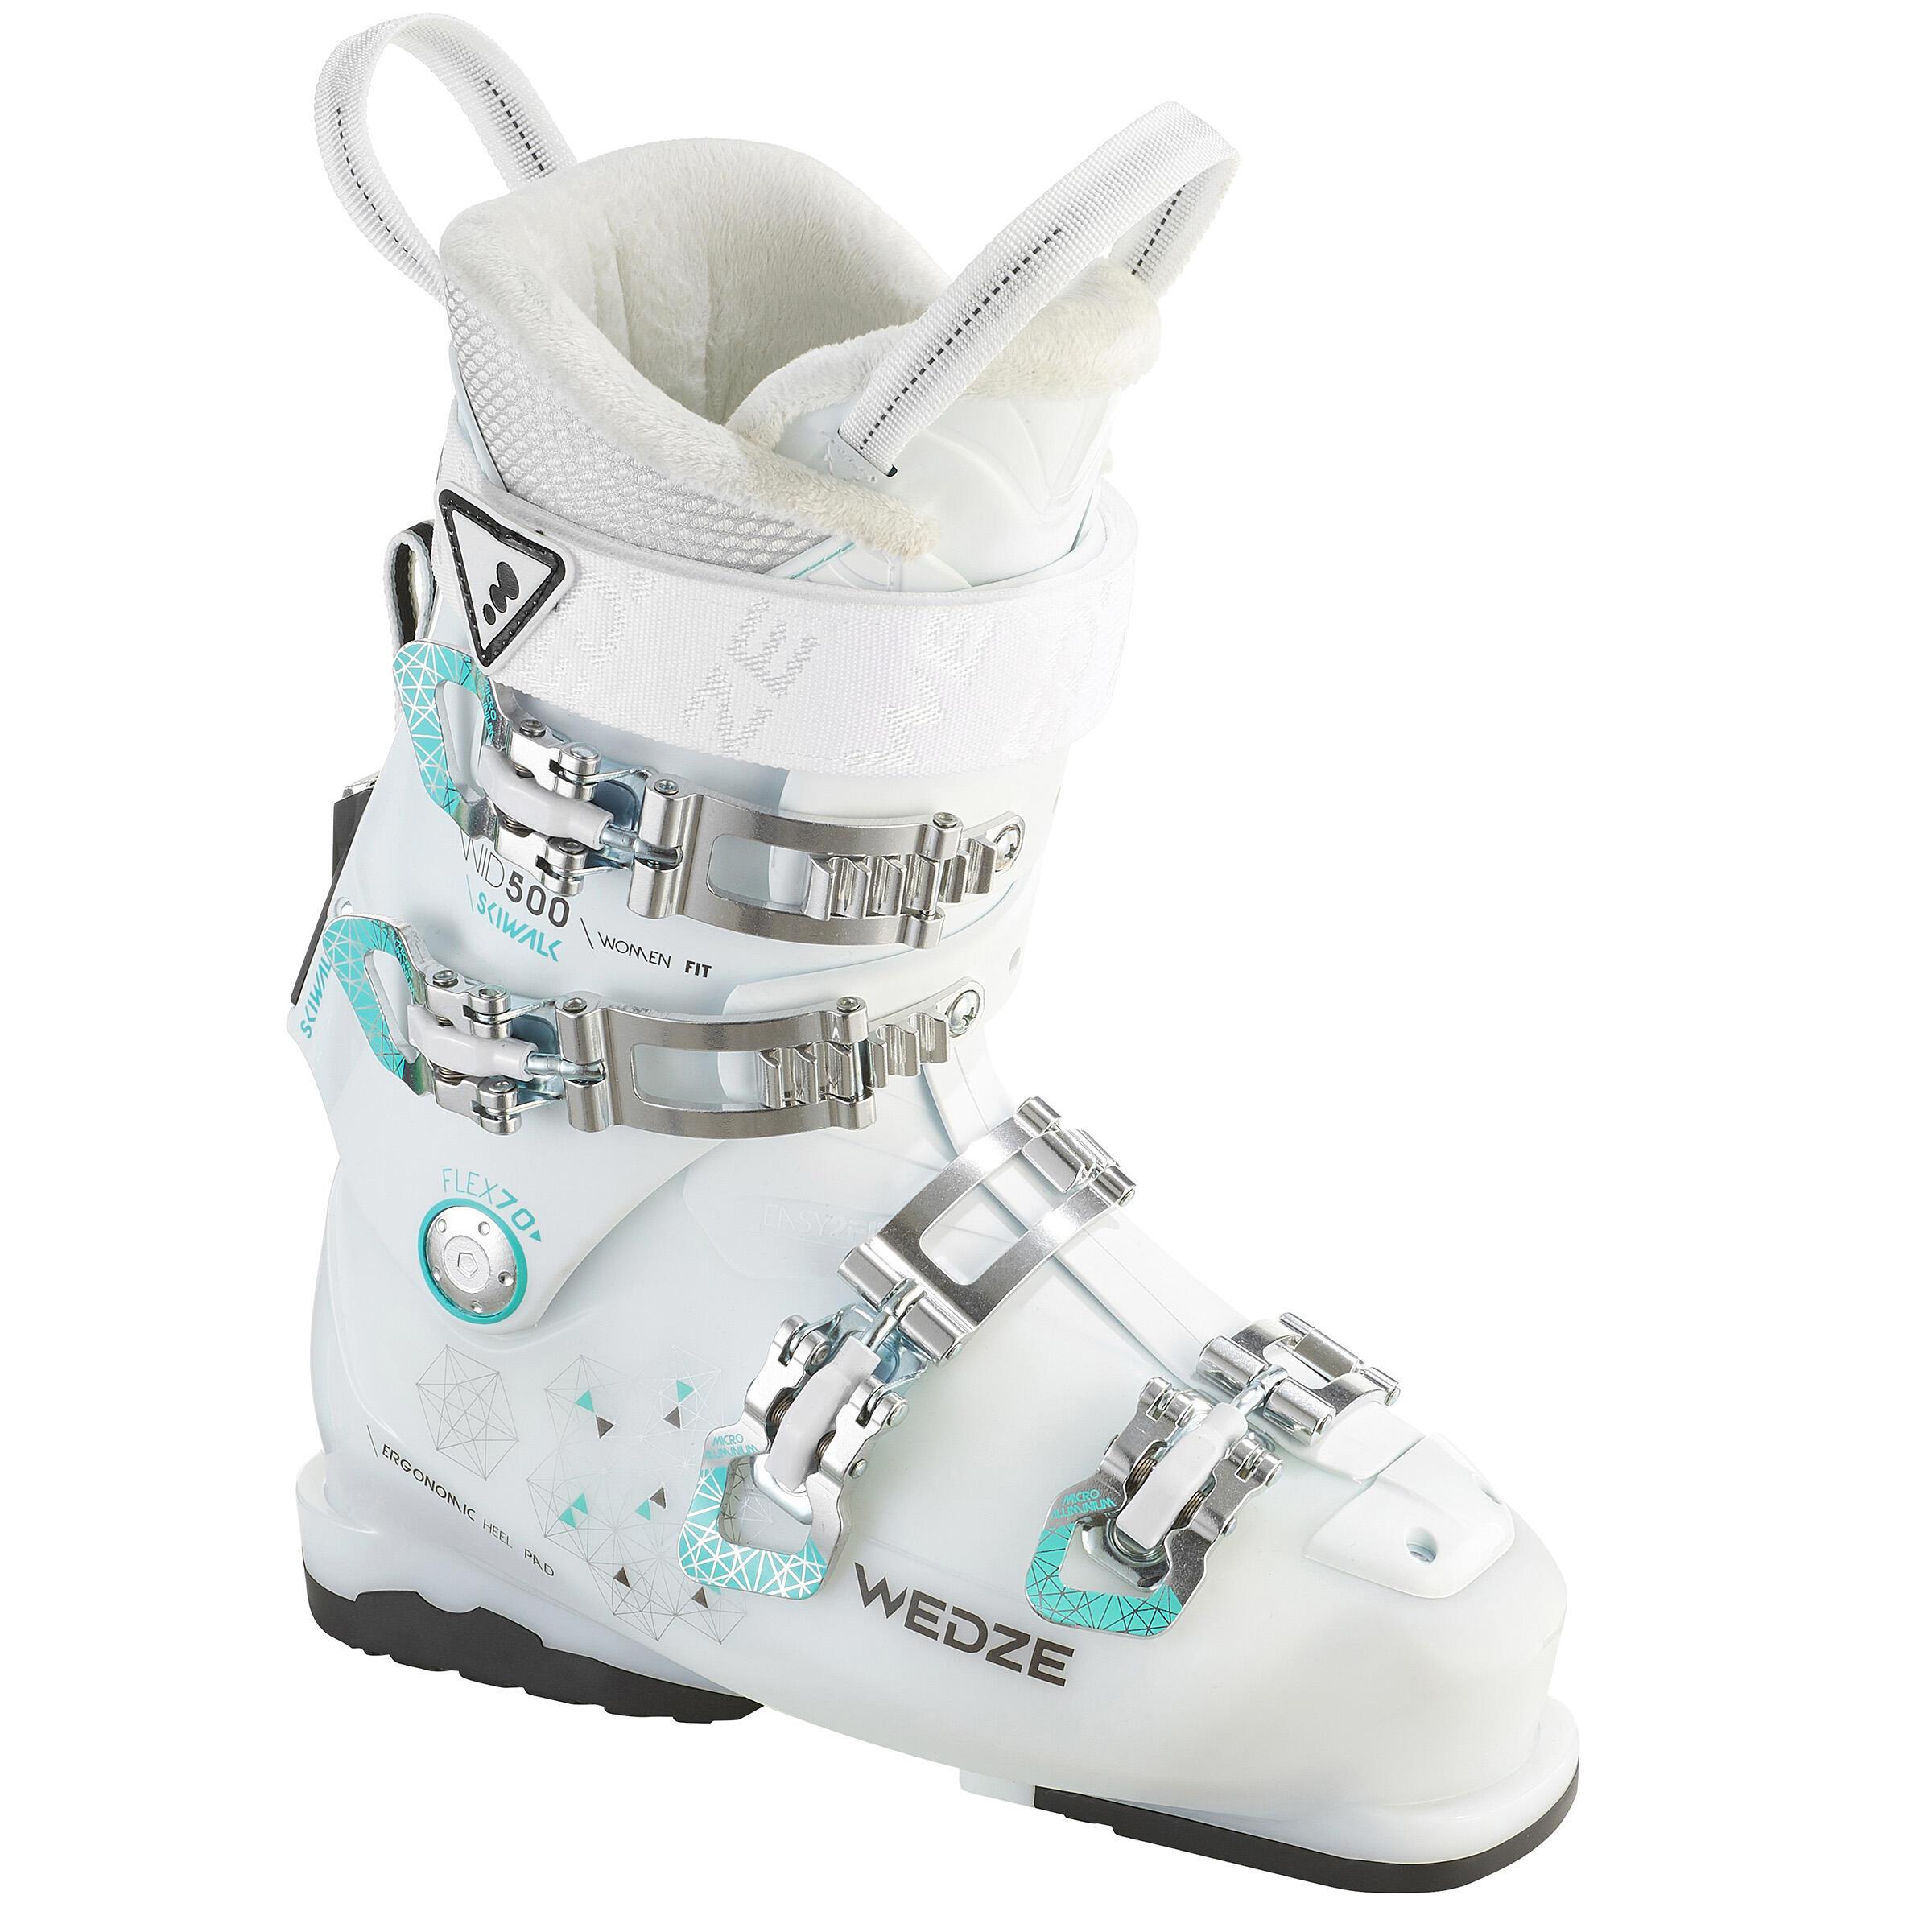 Wed'ze Skischoenen All Mountain dames XID 500 wit